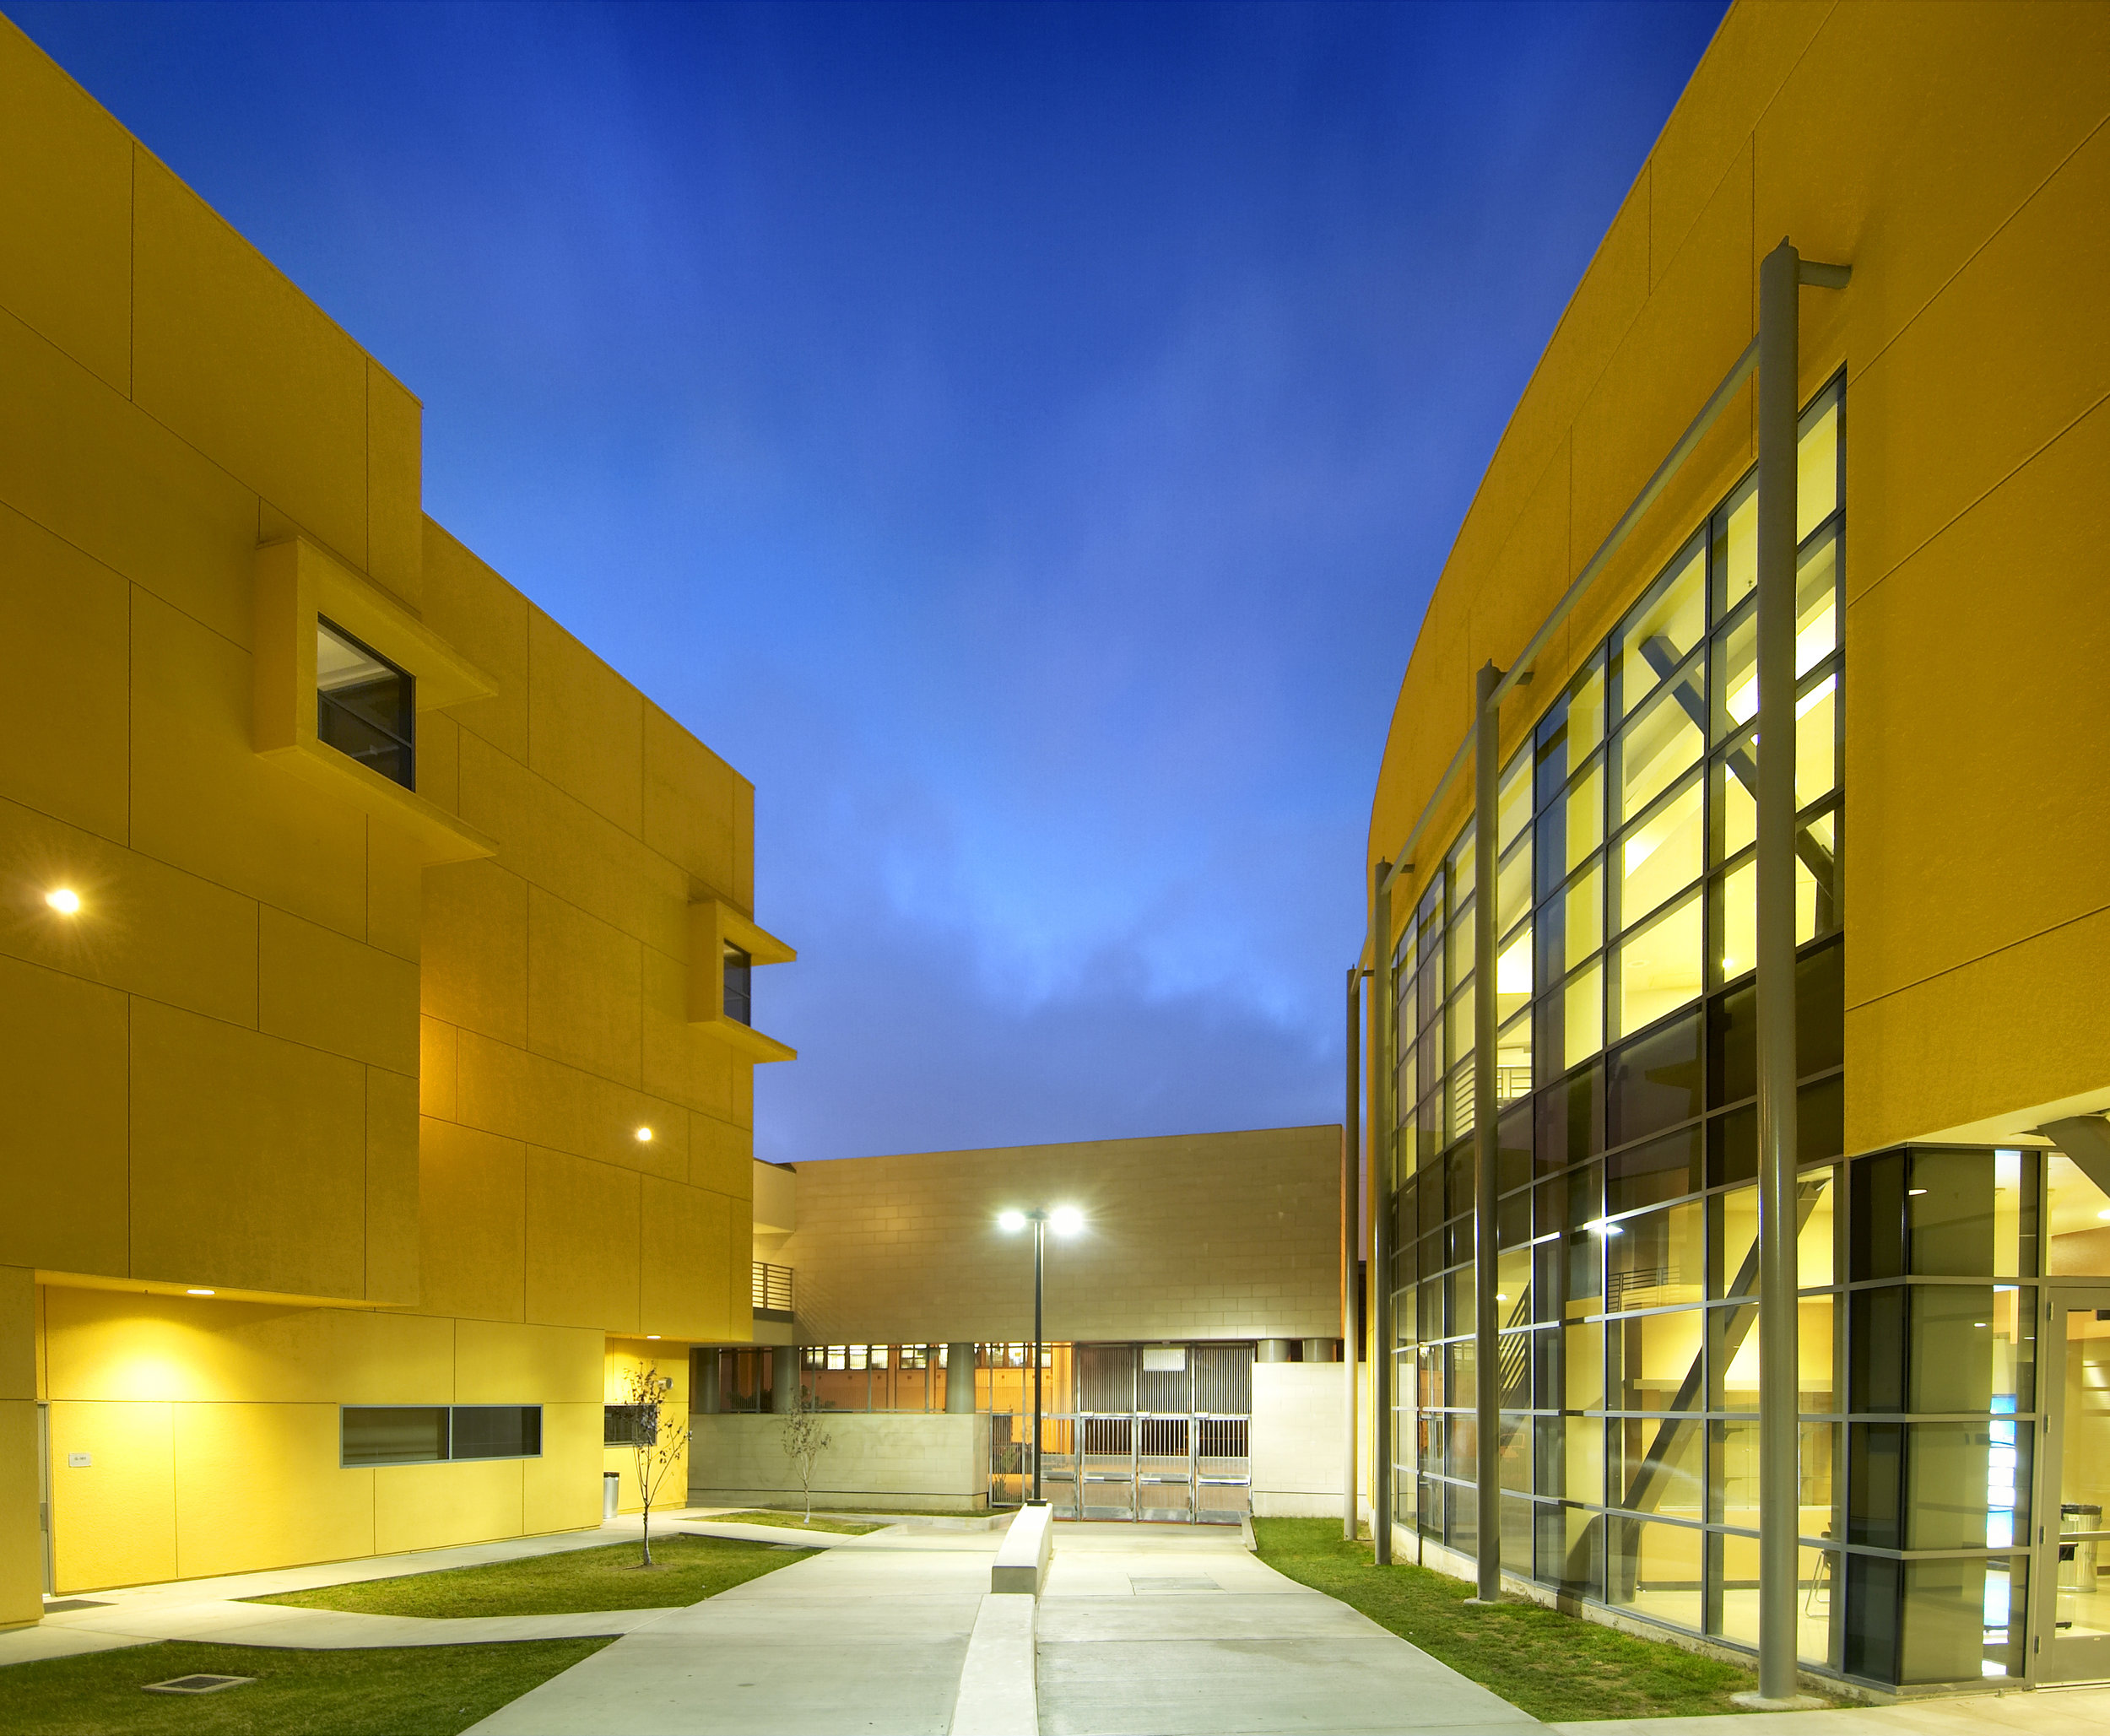 LAUSD Santee Education Complex